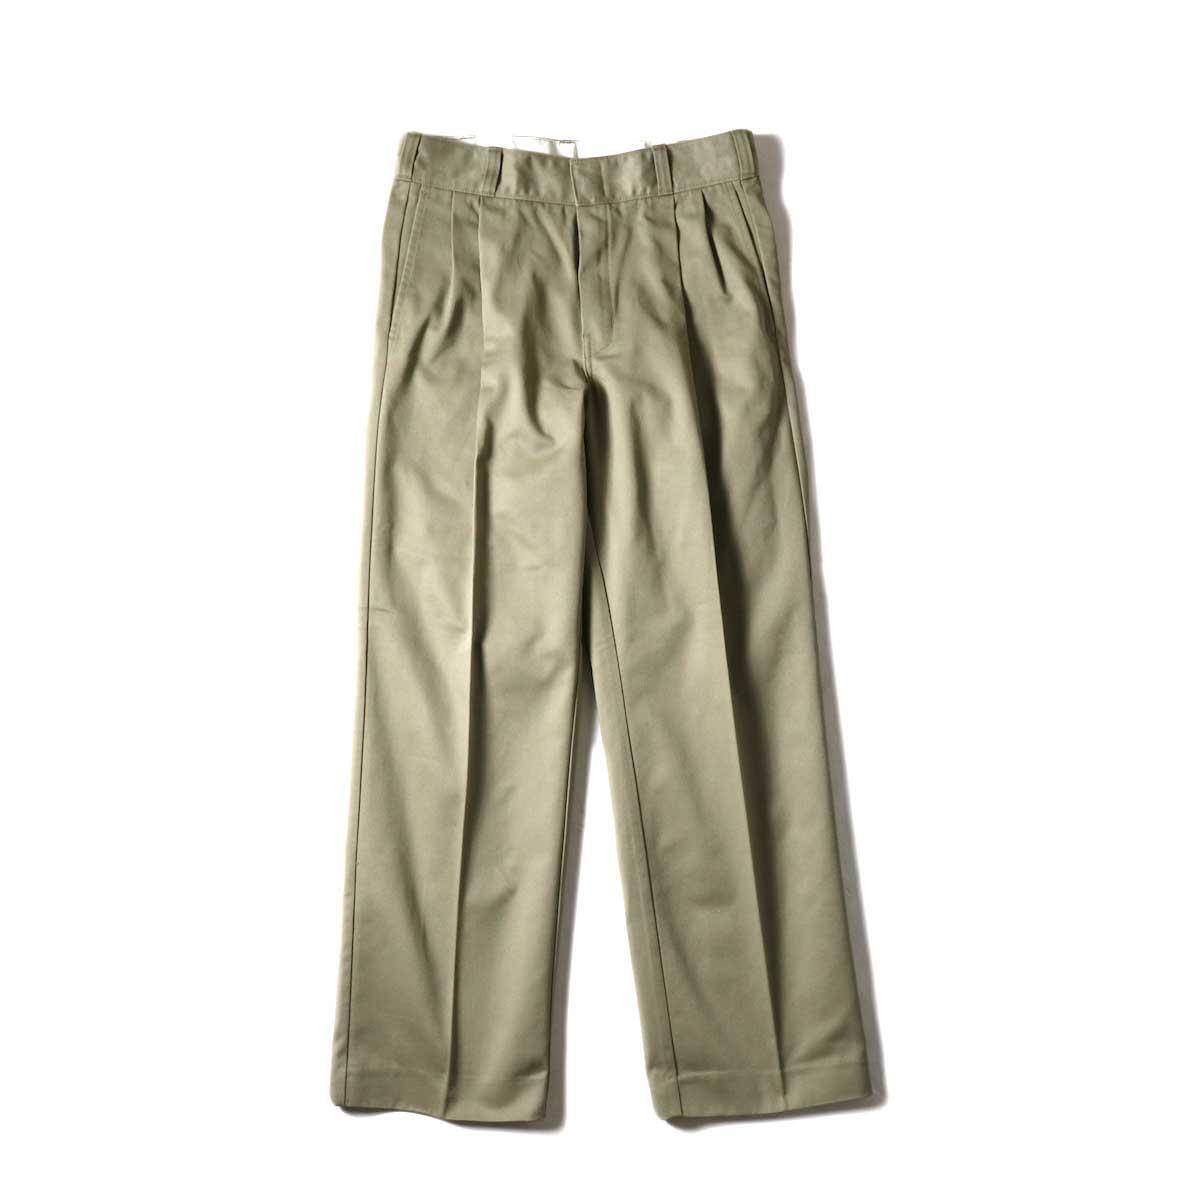 UNUSED / UW0913 Unused x Dickies  2Tuck Pants (Beige)